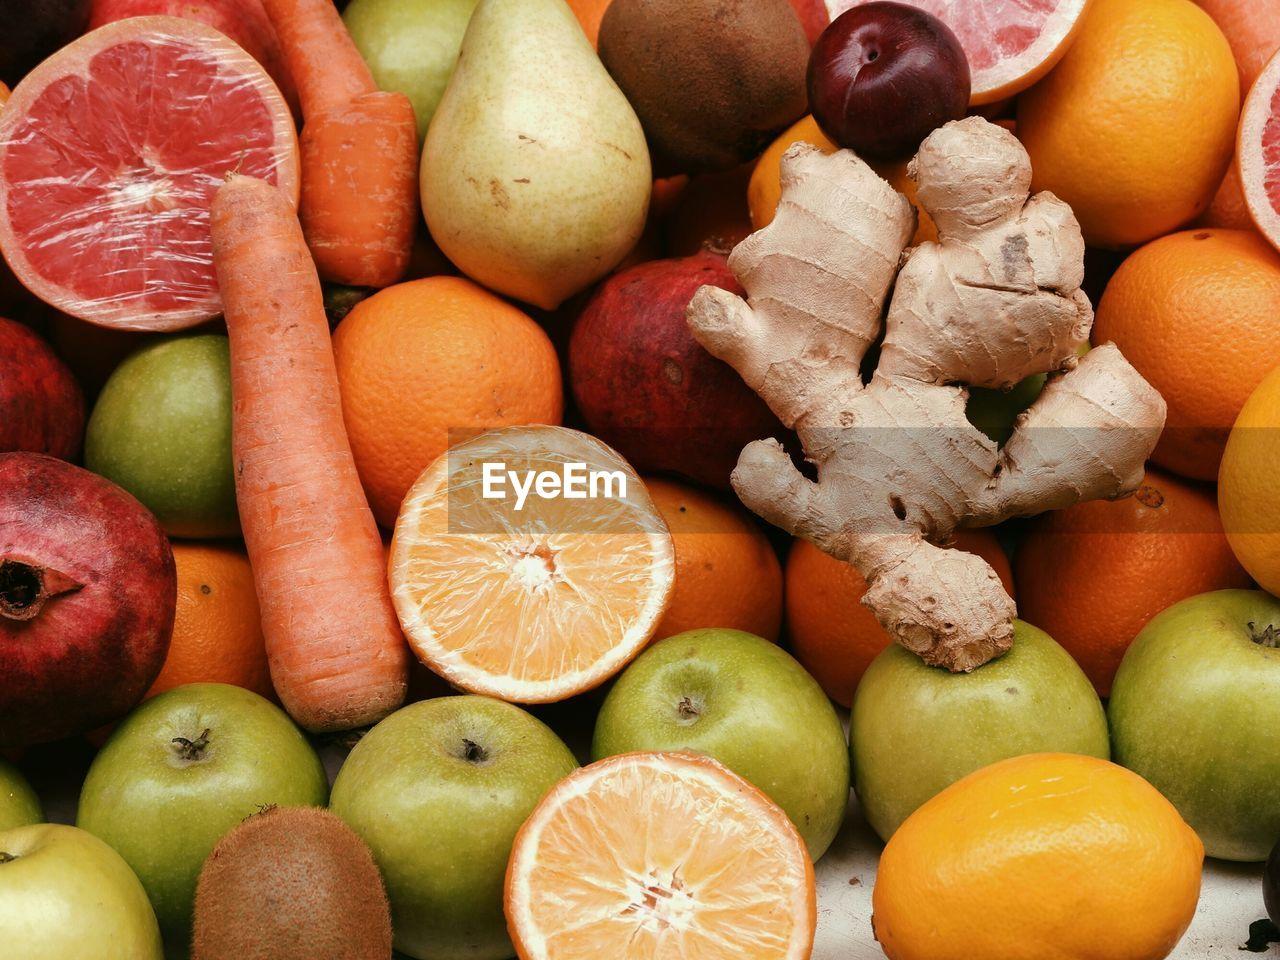 FULL FRAME SHOT OF APPLES AND FRUITS